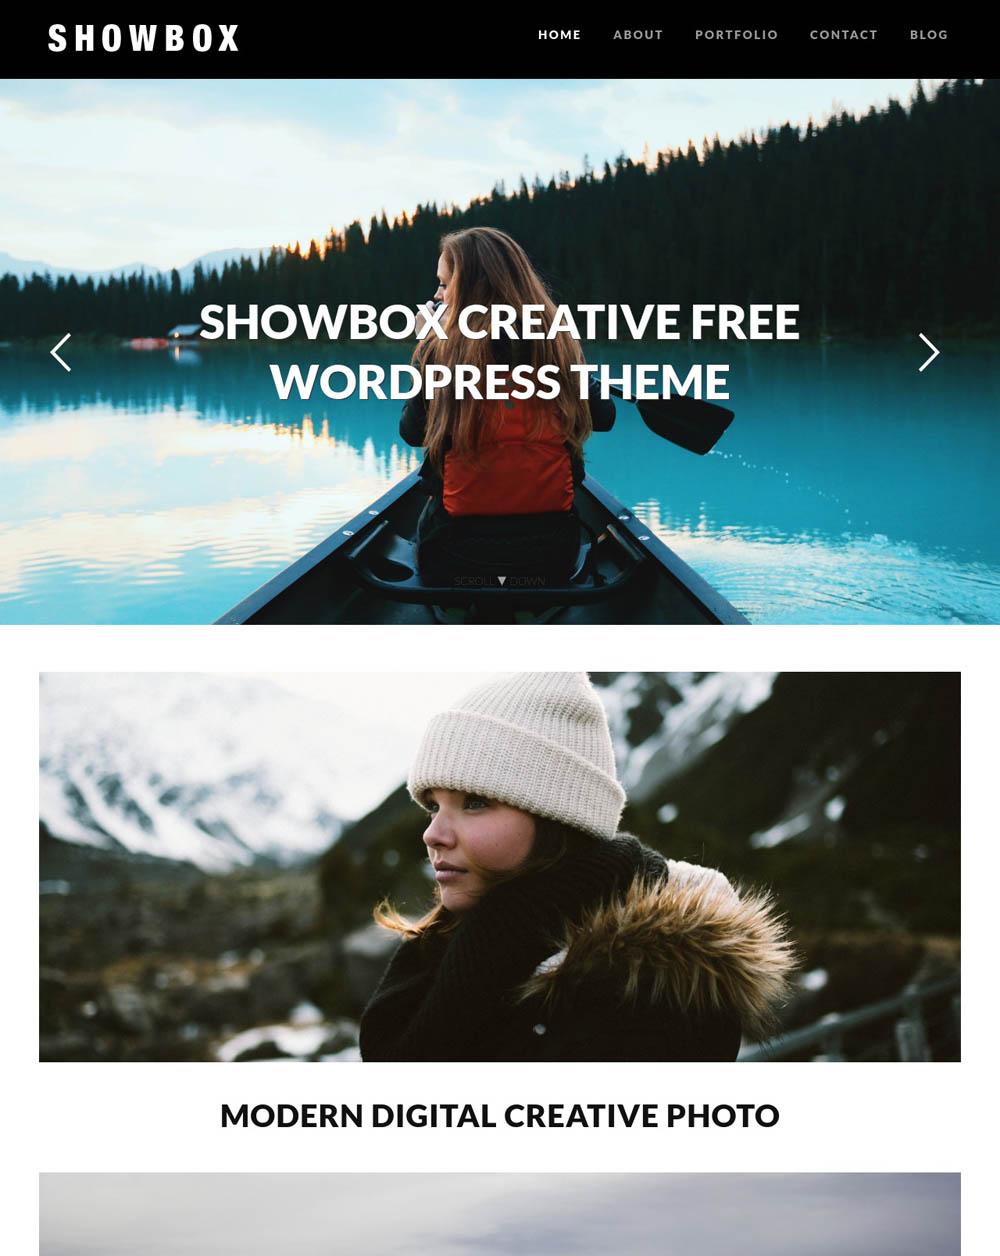 Showbox WordPress Theme for designers